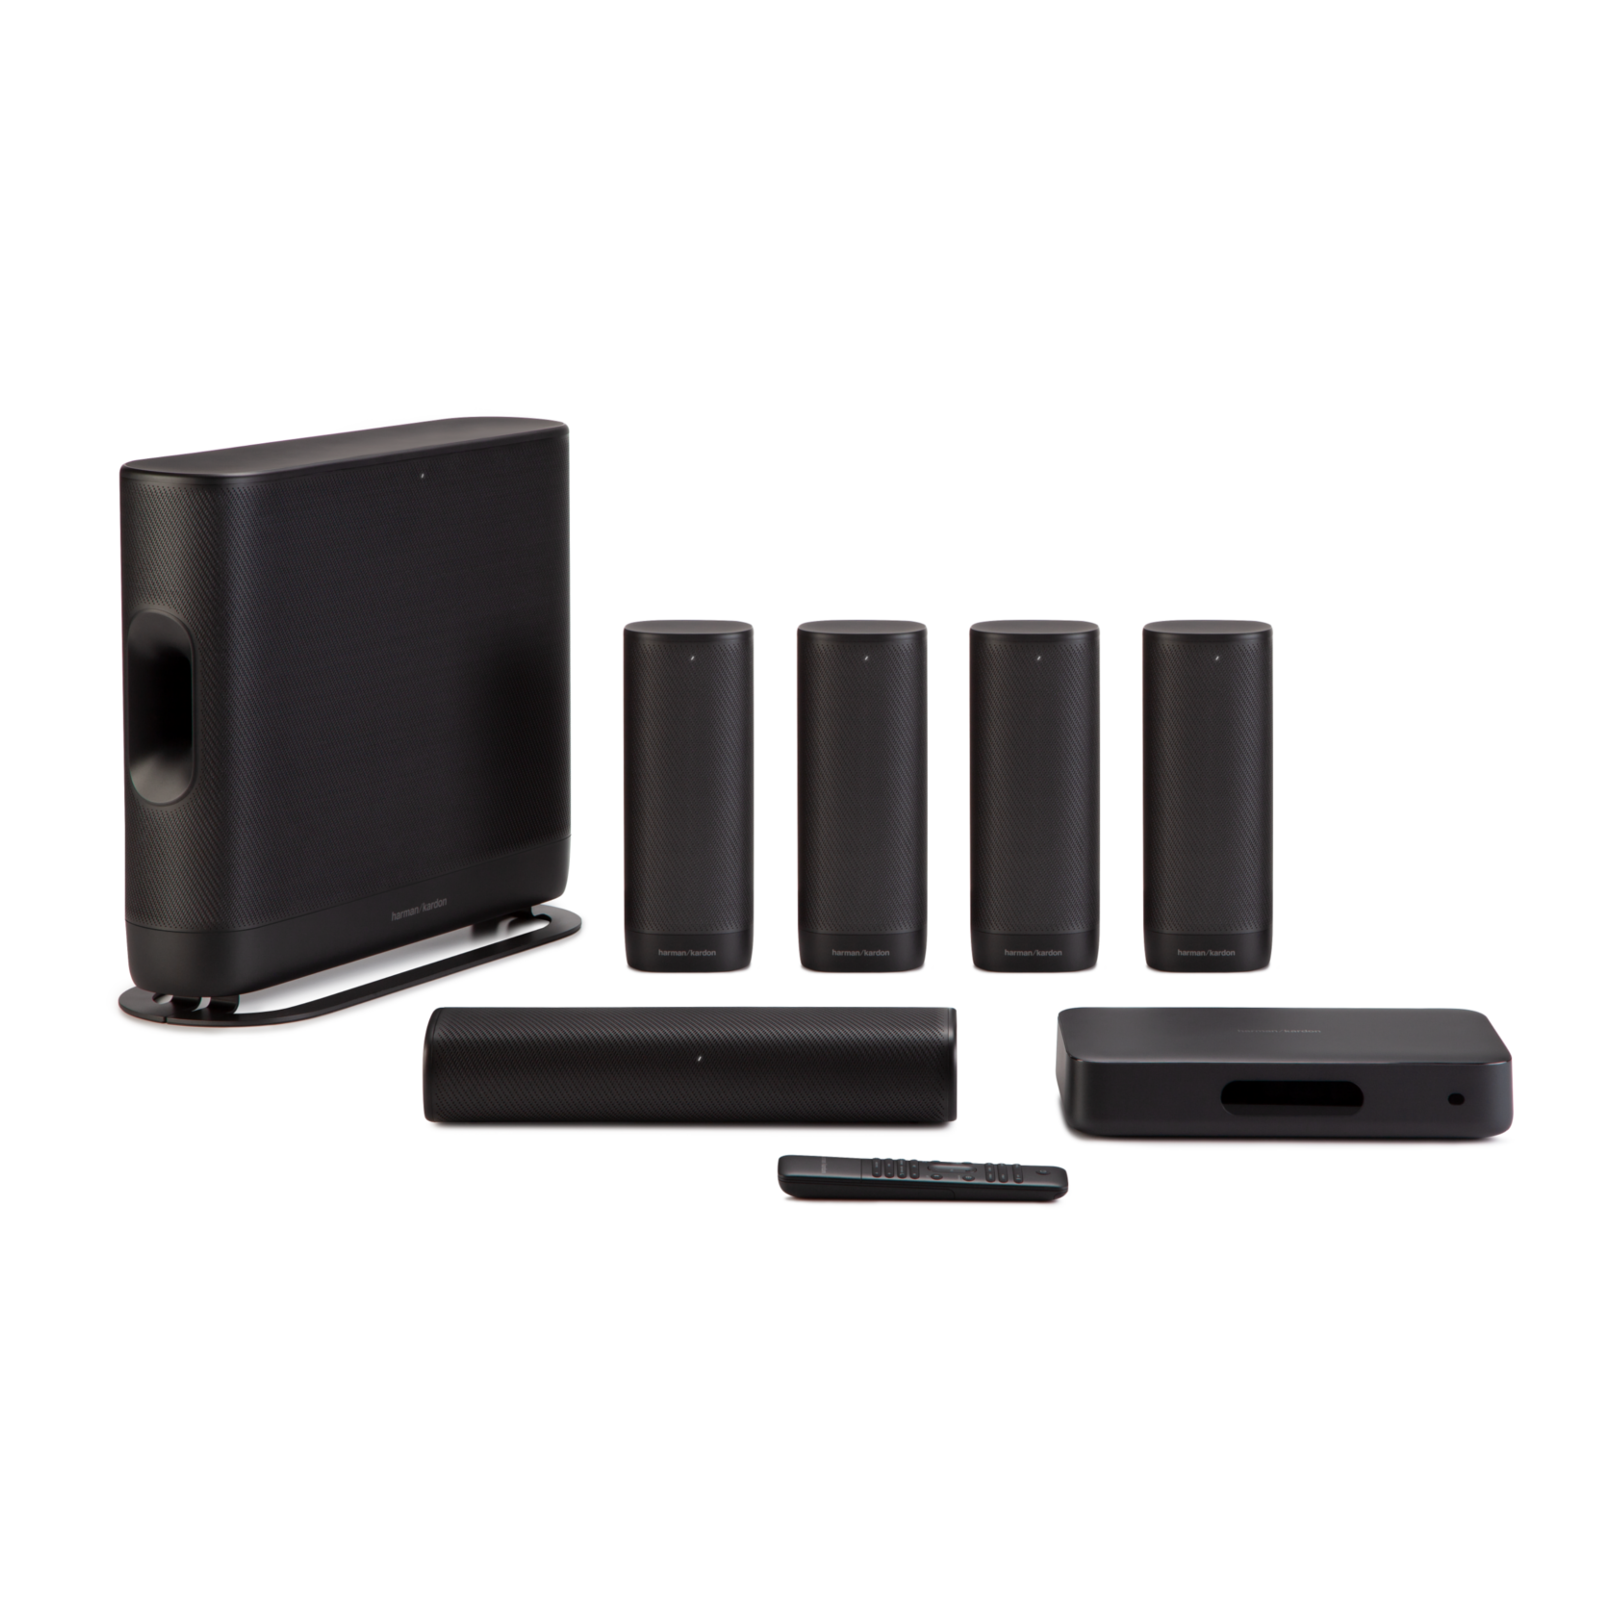 Harman Kardon Surround - Black - Wireless Home Theater System - Hero